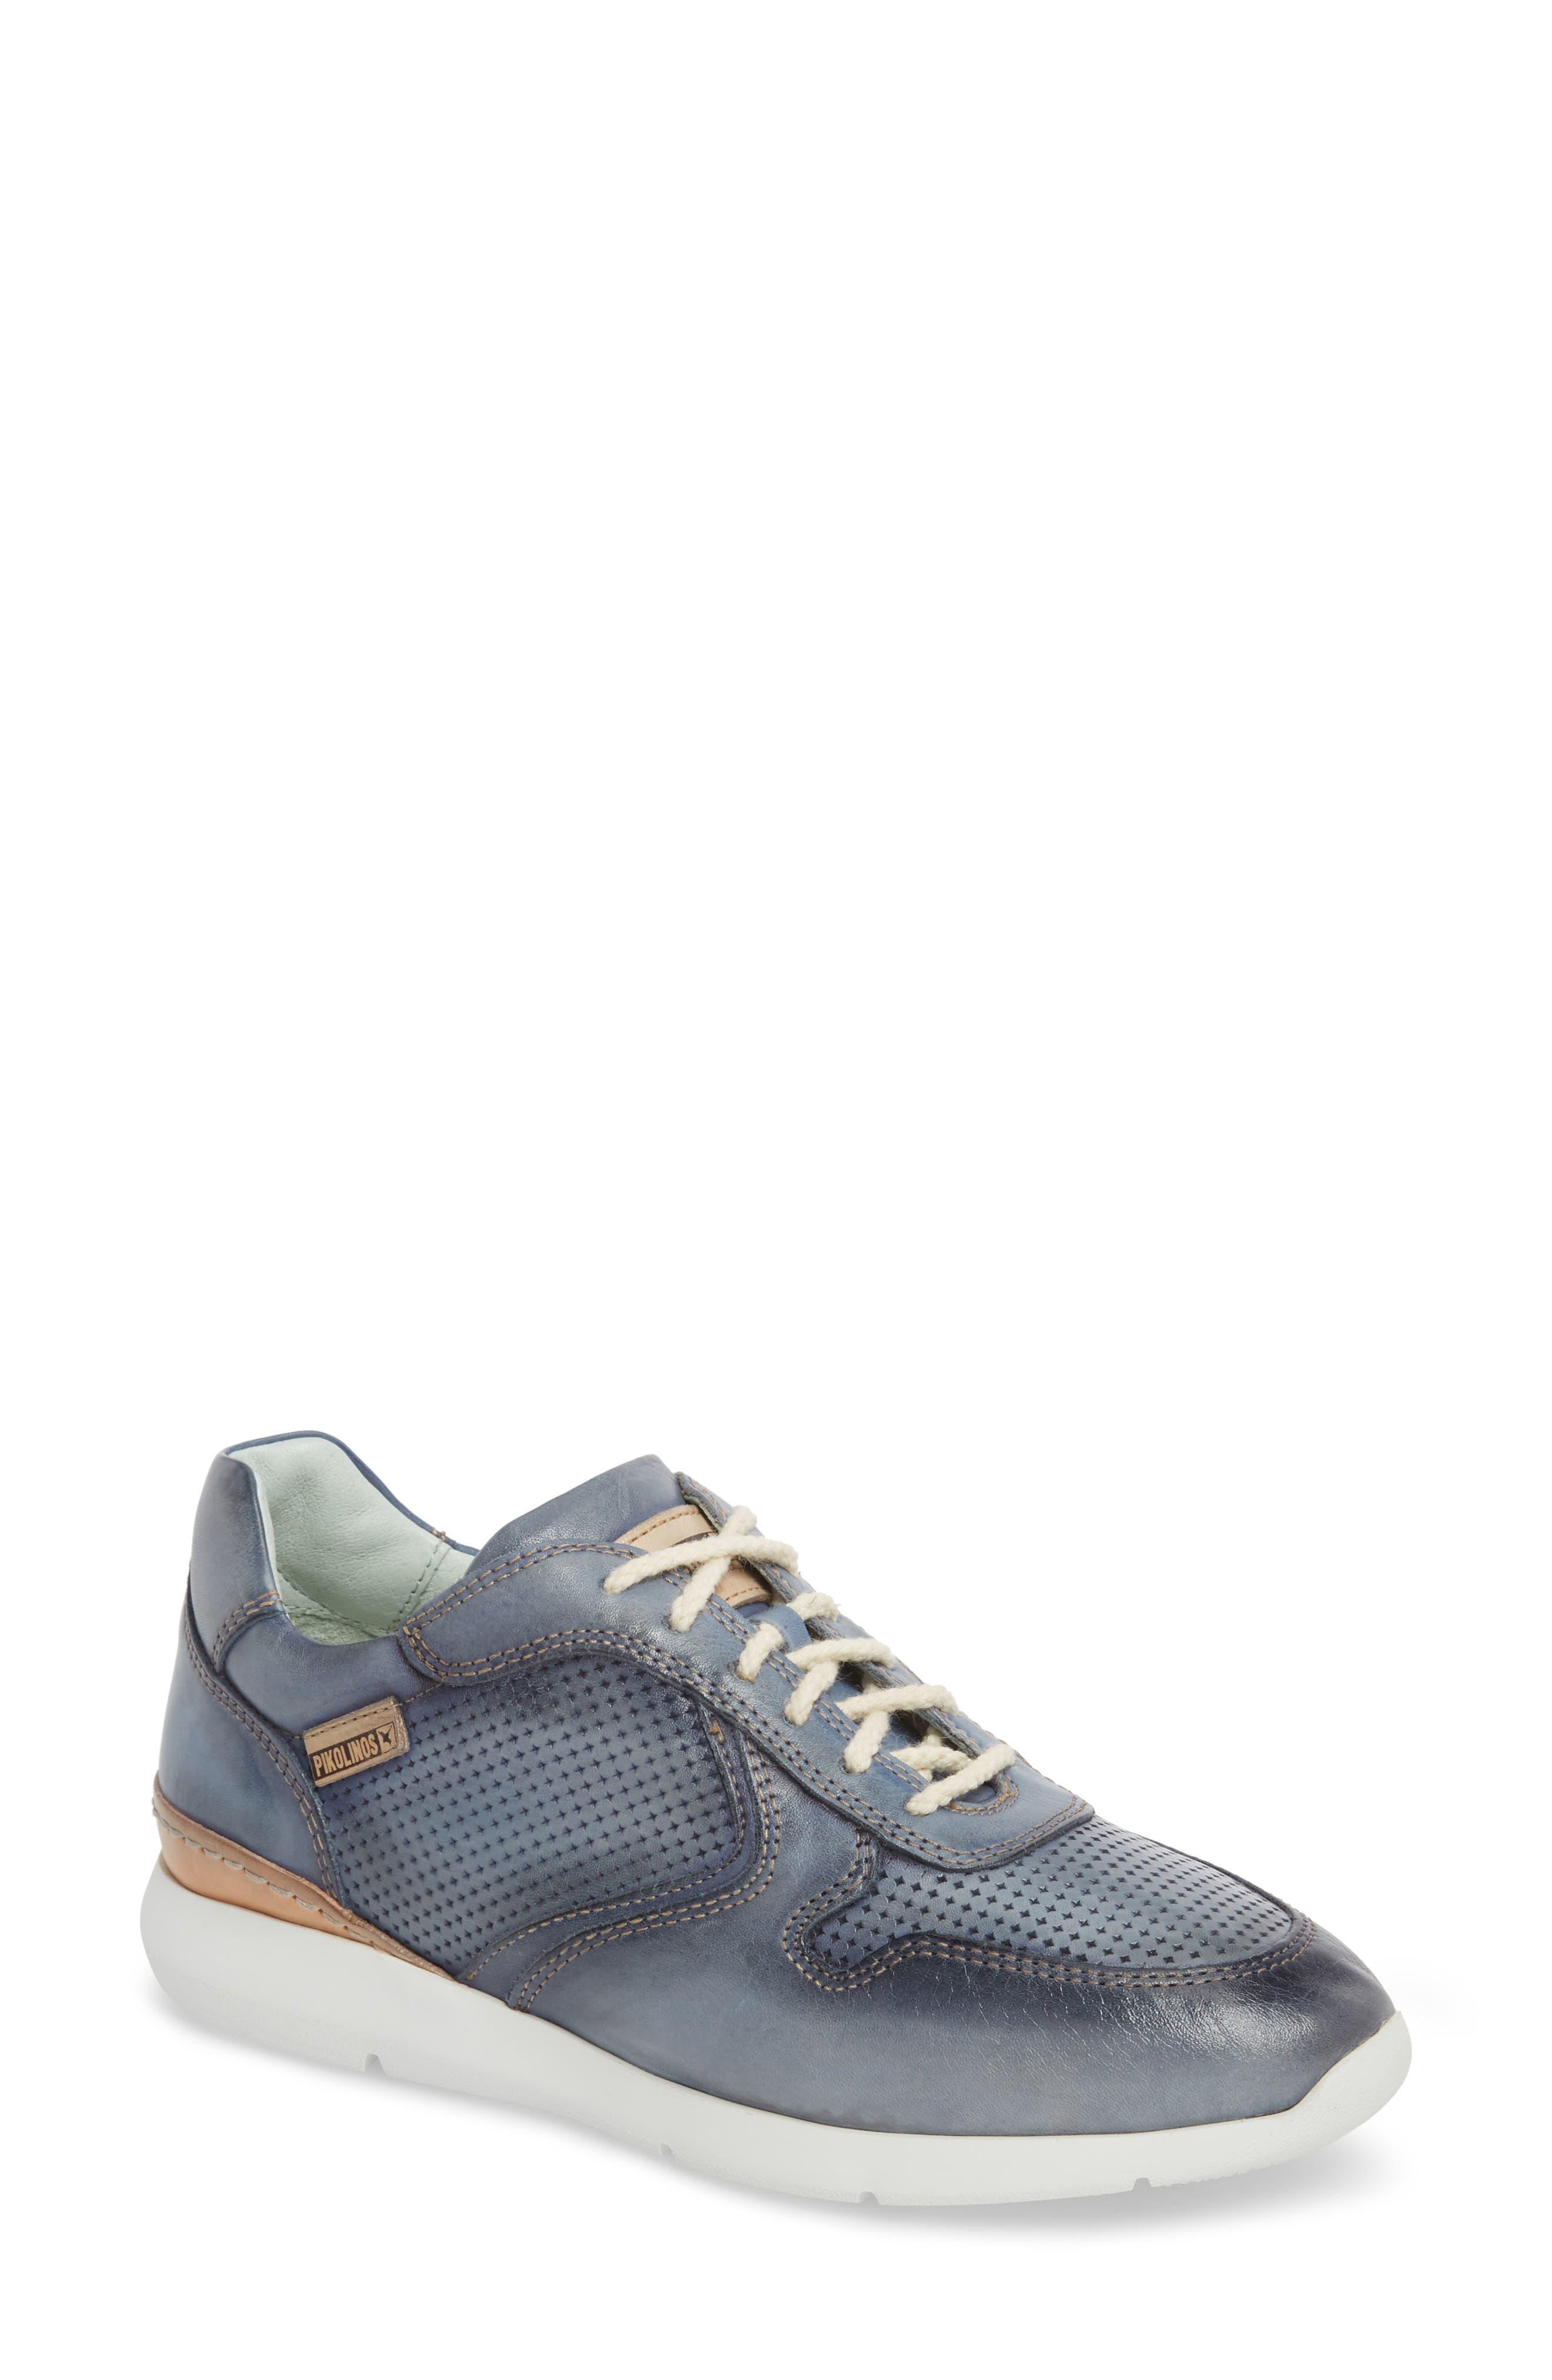 Modena Sneaker,                             Main thumbnail 1, color,                             400